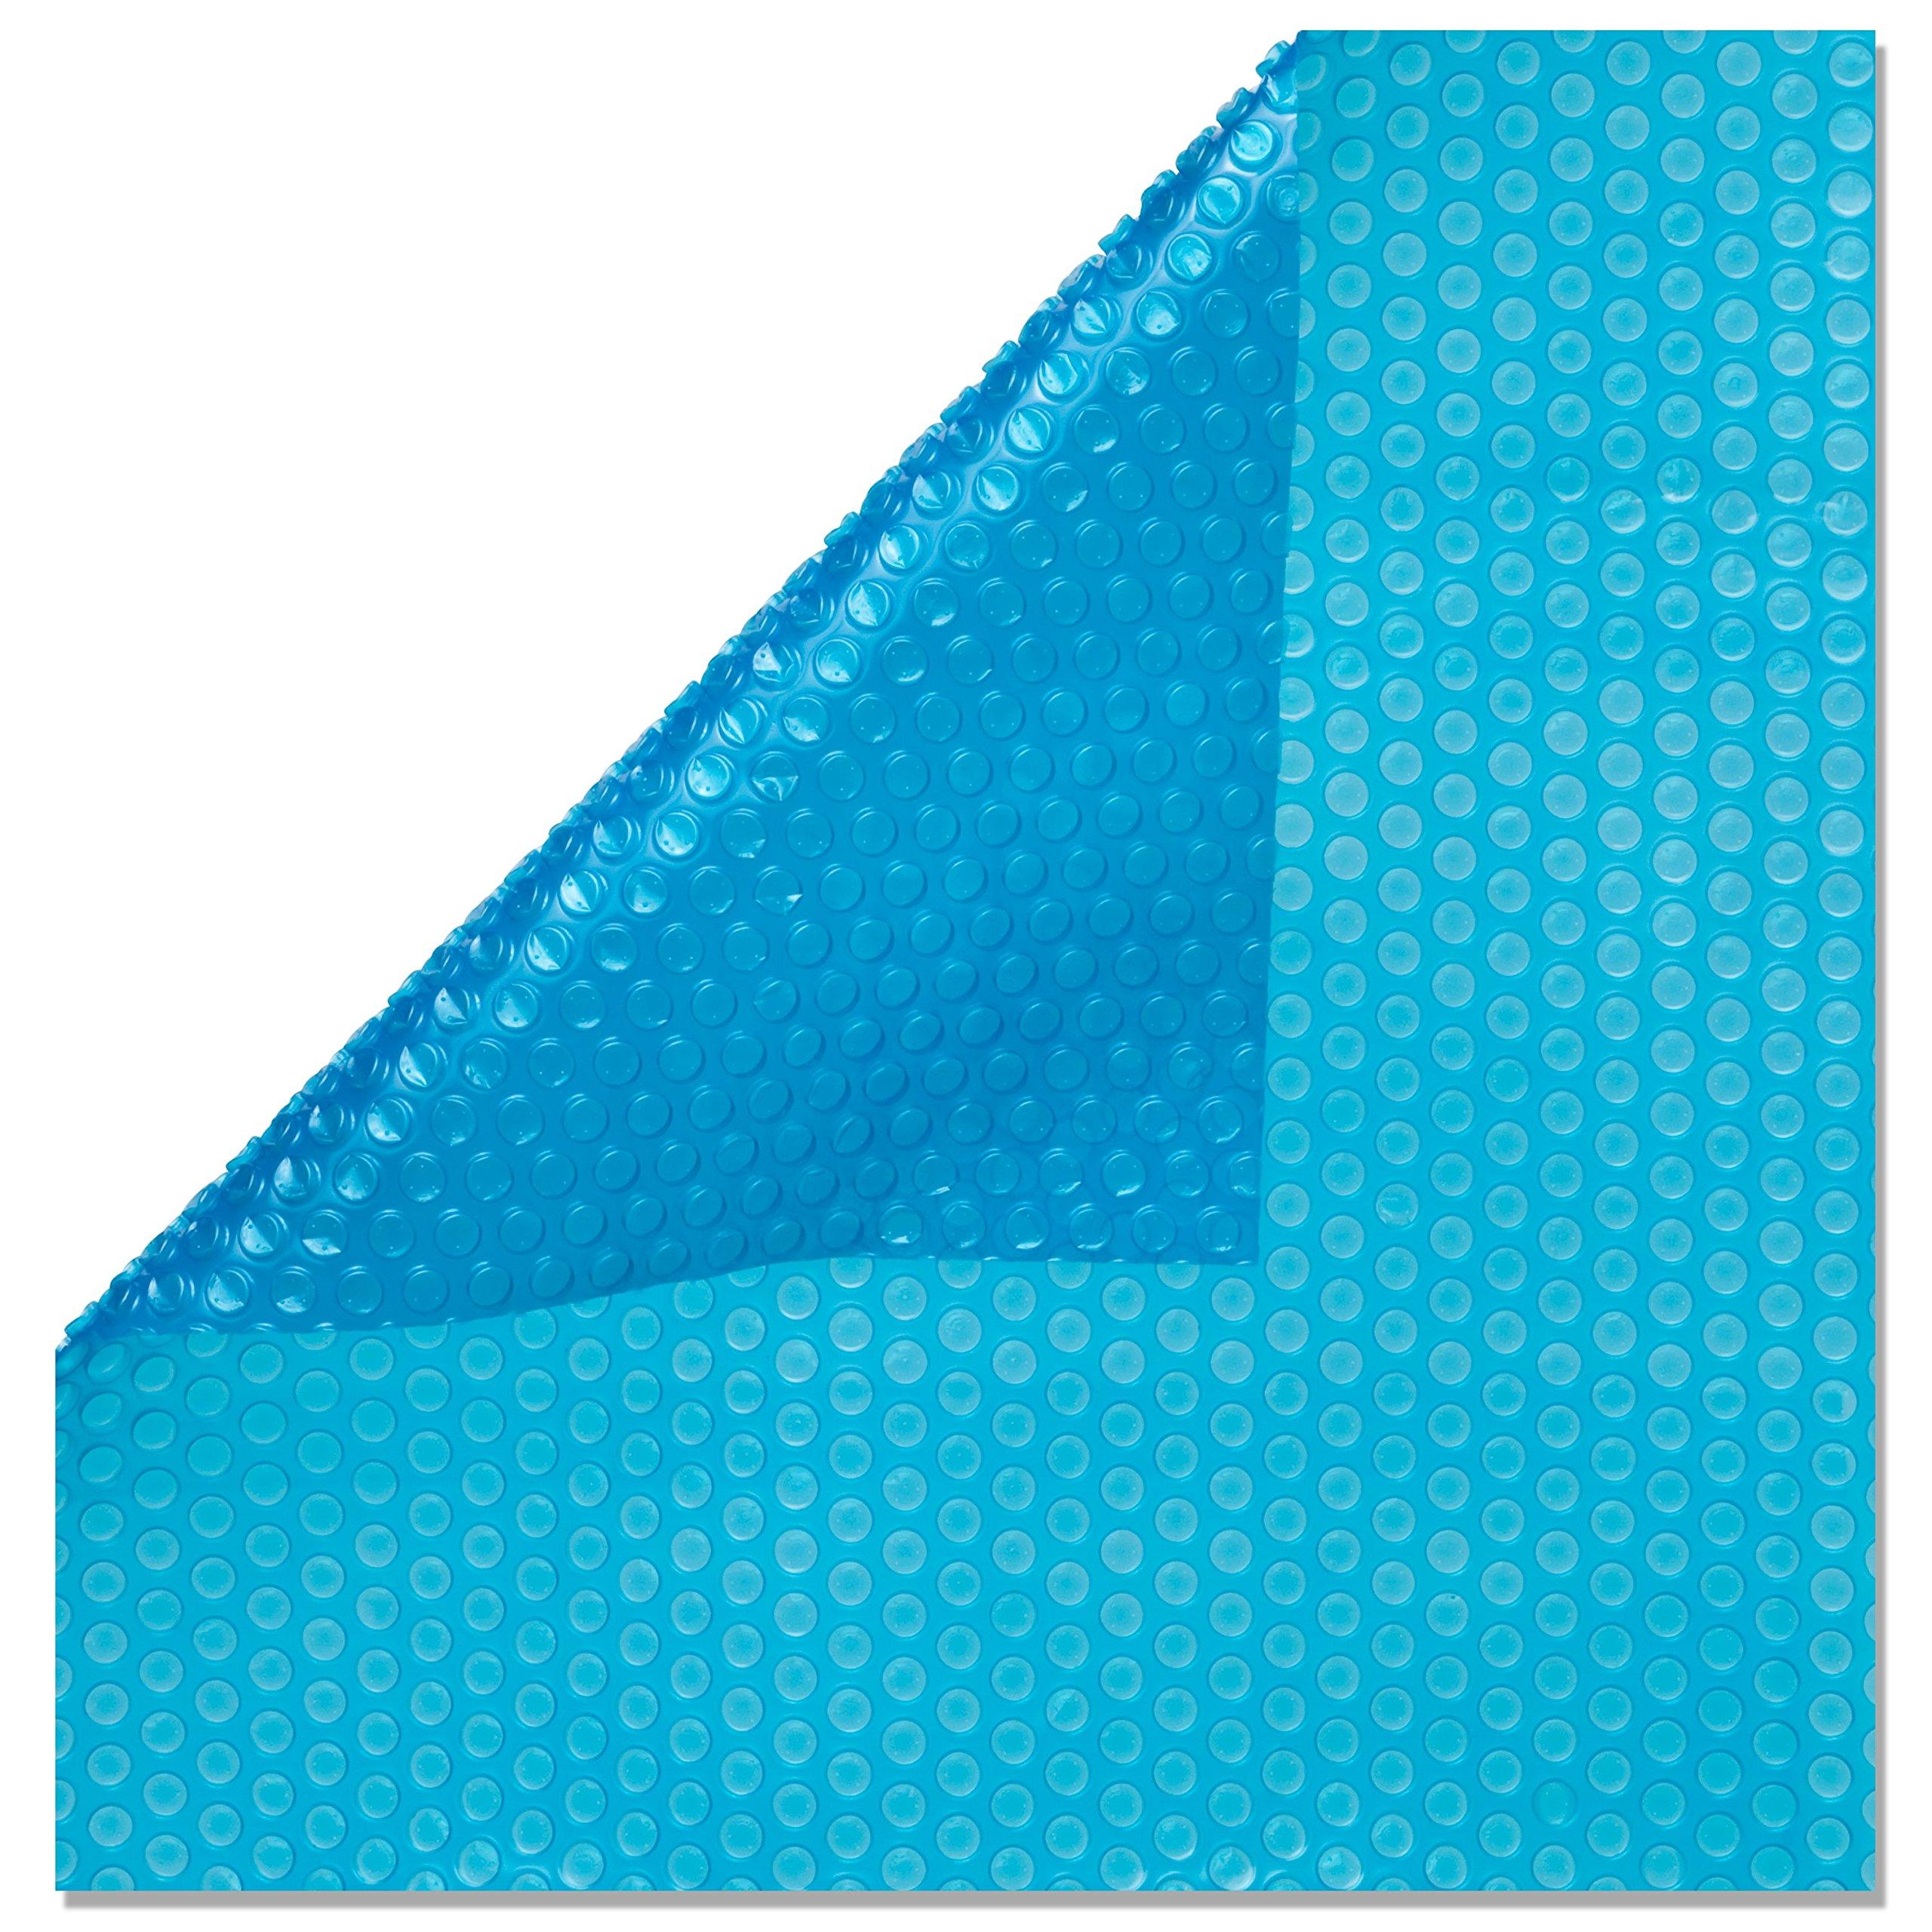 In The Swim 18 Foot Round Basic Pool Solar Blanket Cover 8 Mil